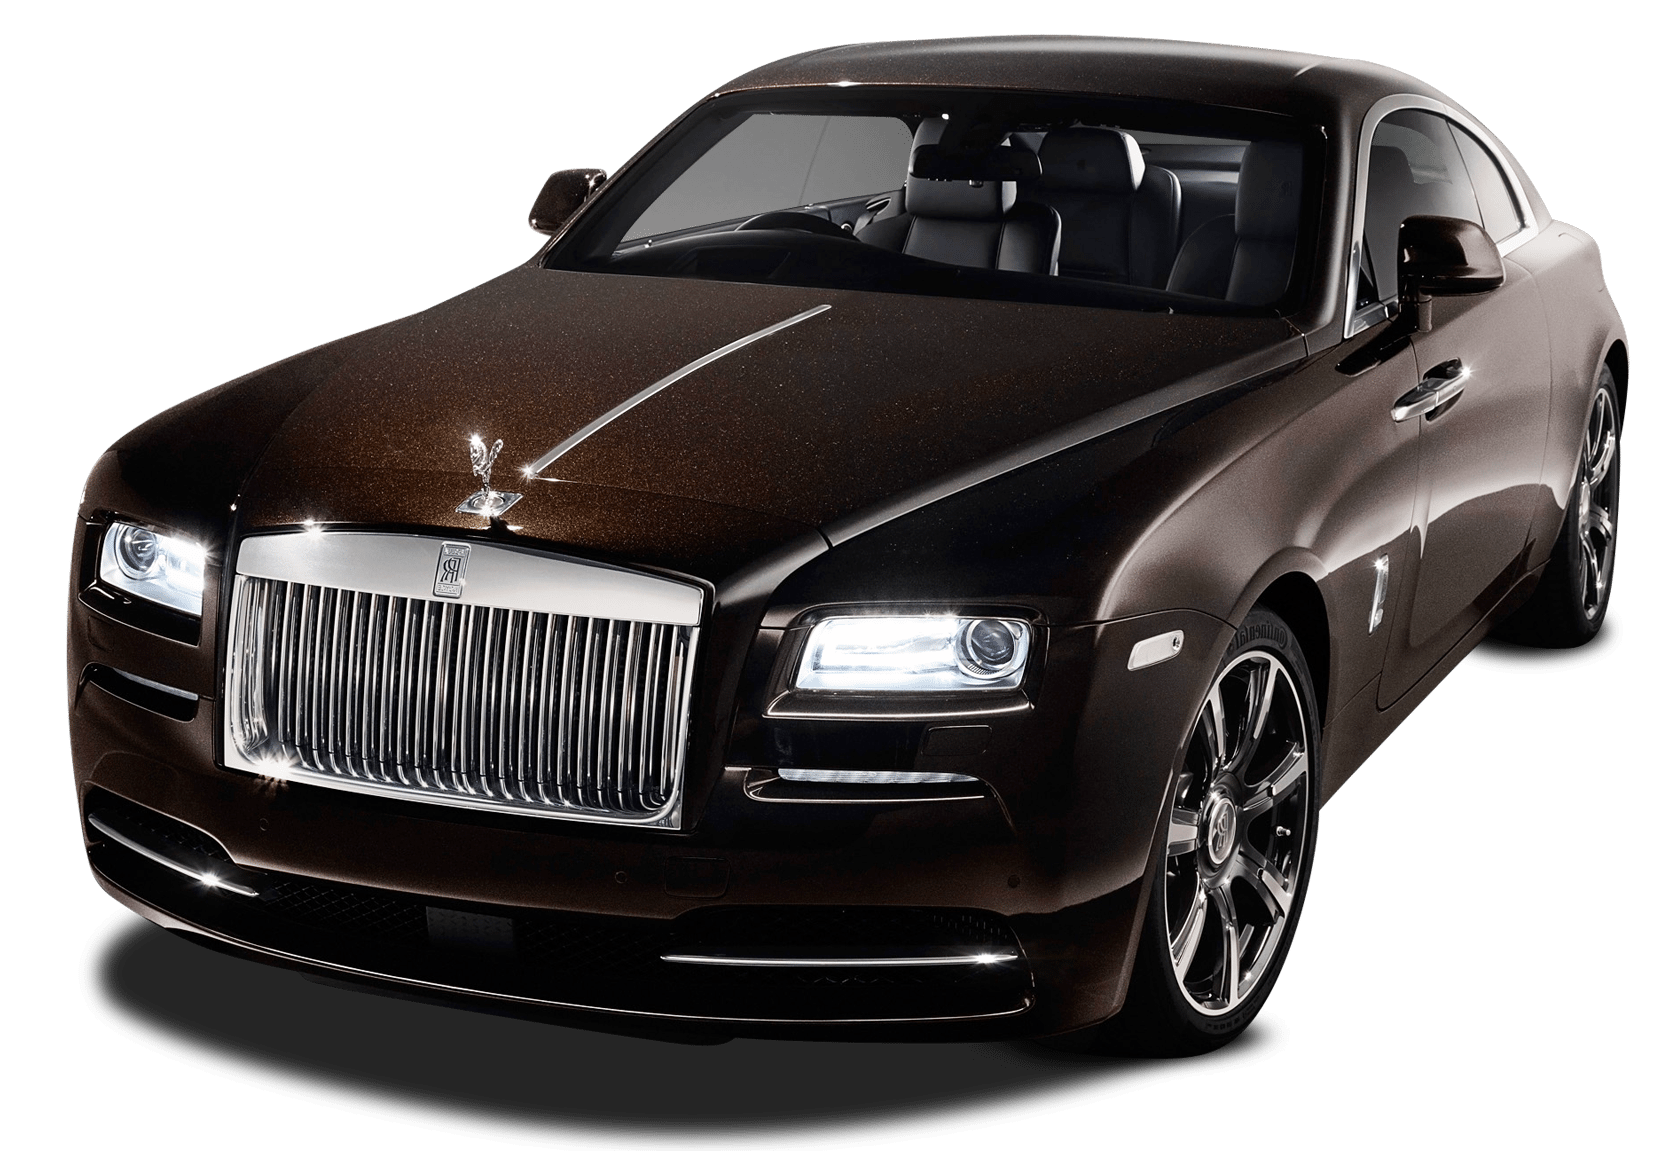 Rolls Royce Car PNG Image